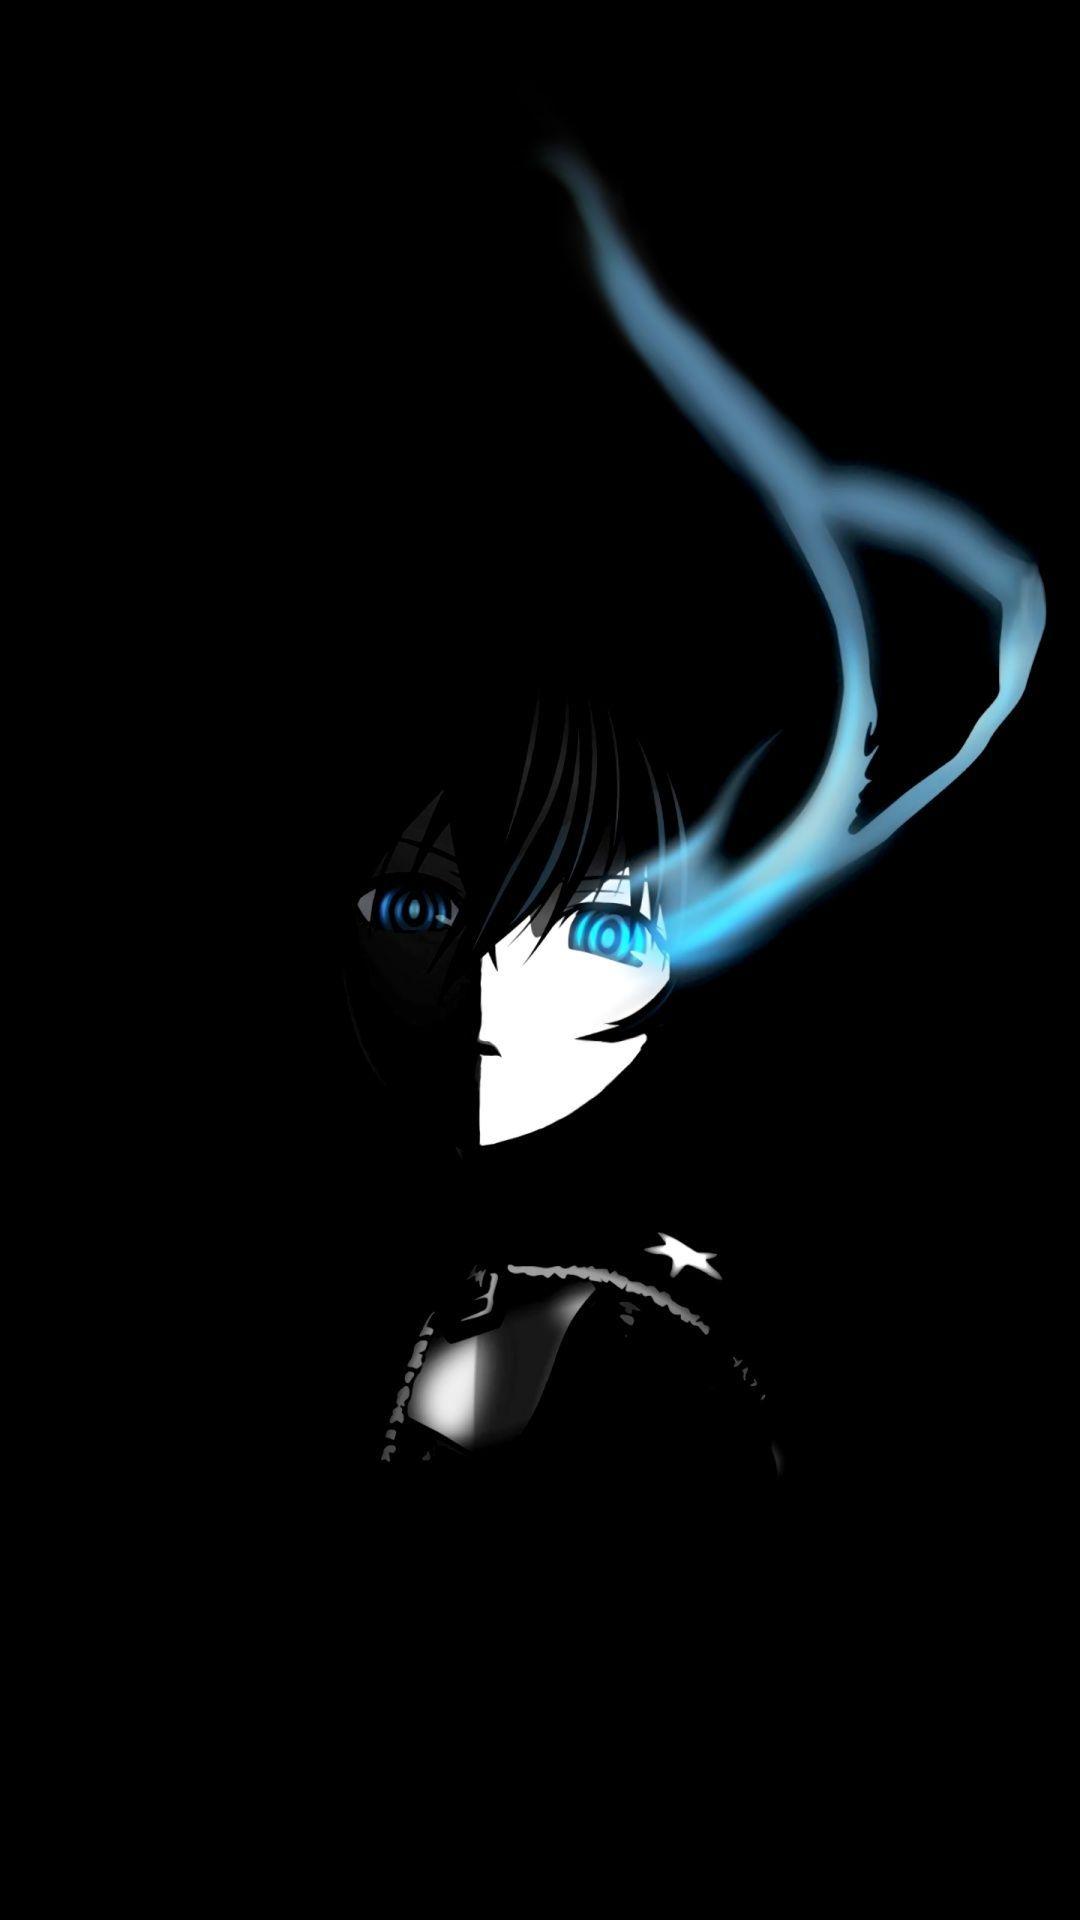 3d Animation Background Image Black Rock Shooter Anime Wallpaper Black Wallpaper